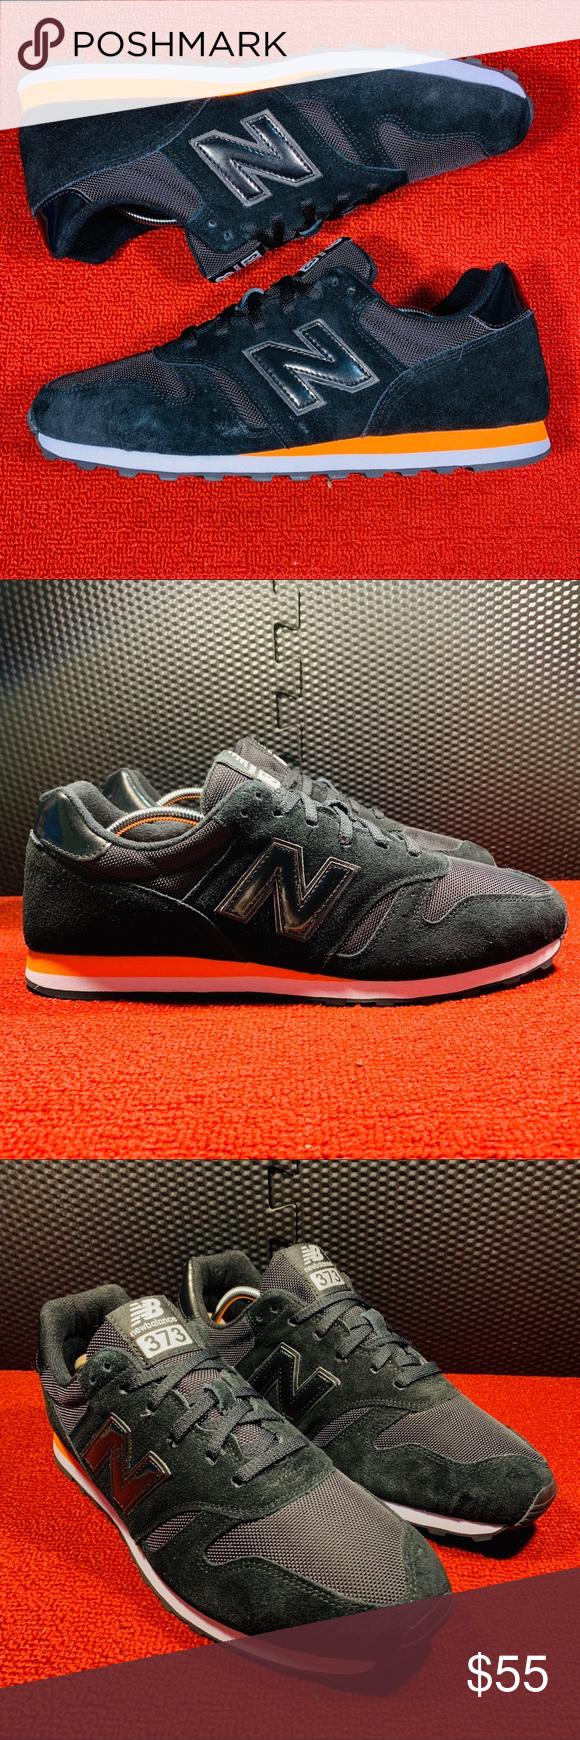 ❌SOLD❌Suede New Balance 373 Black & Orange | Orange black, Suede ...